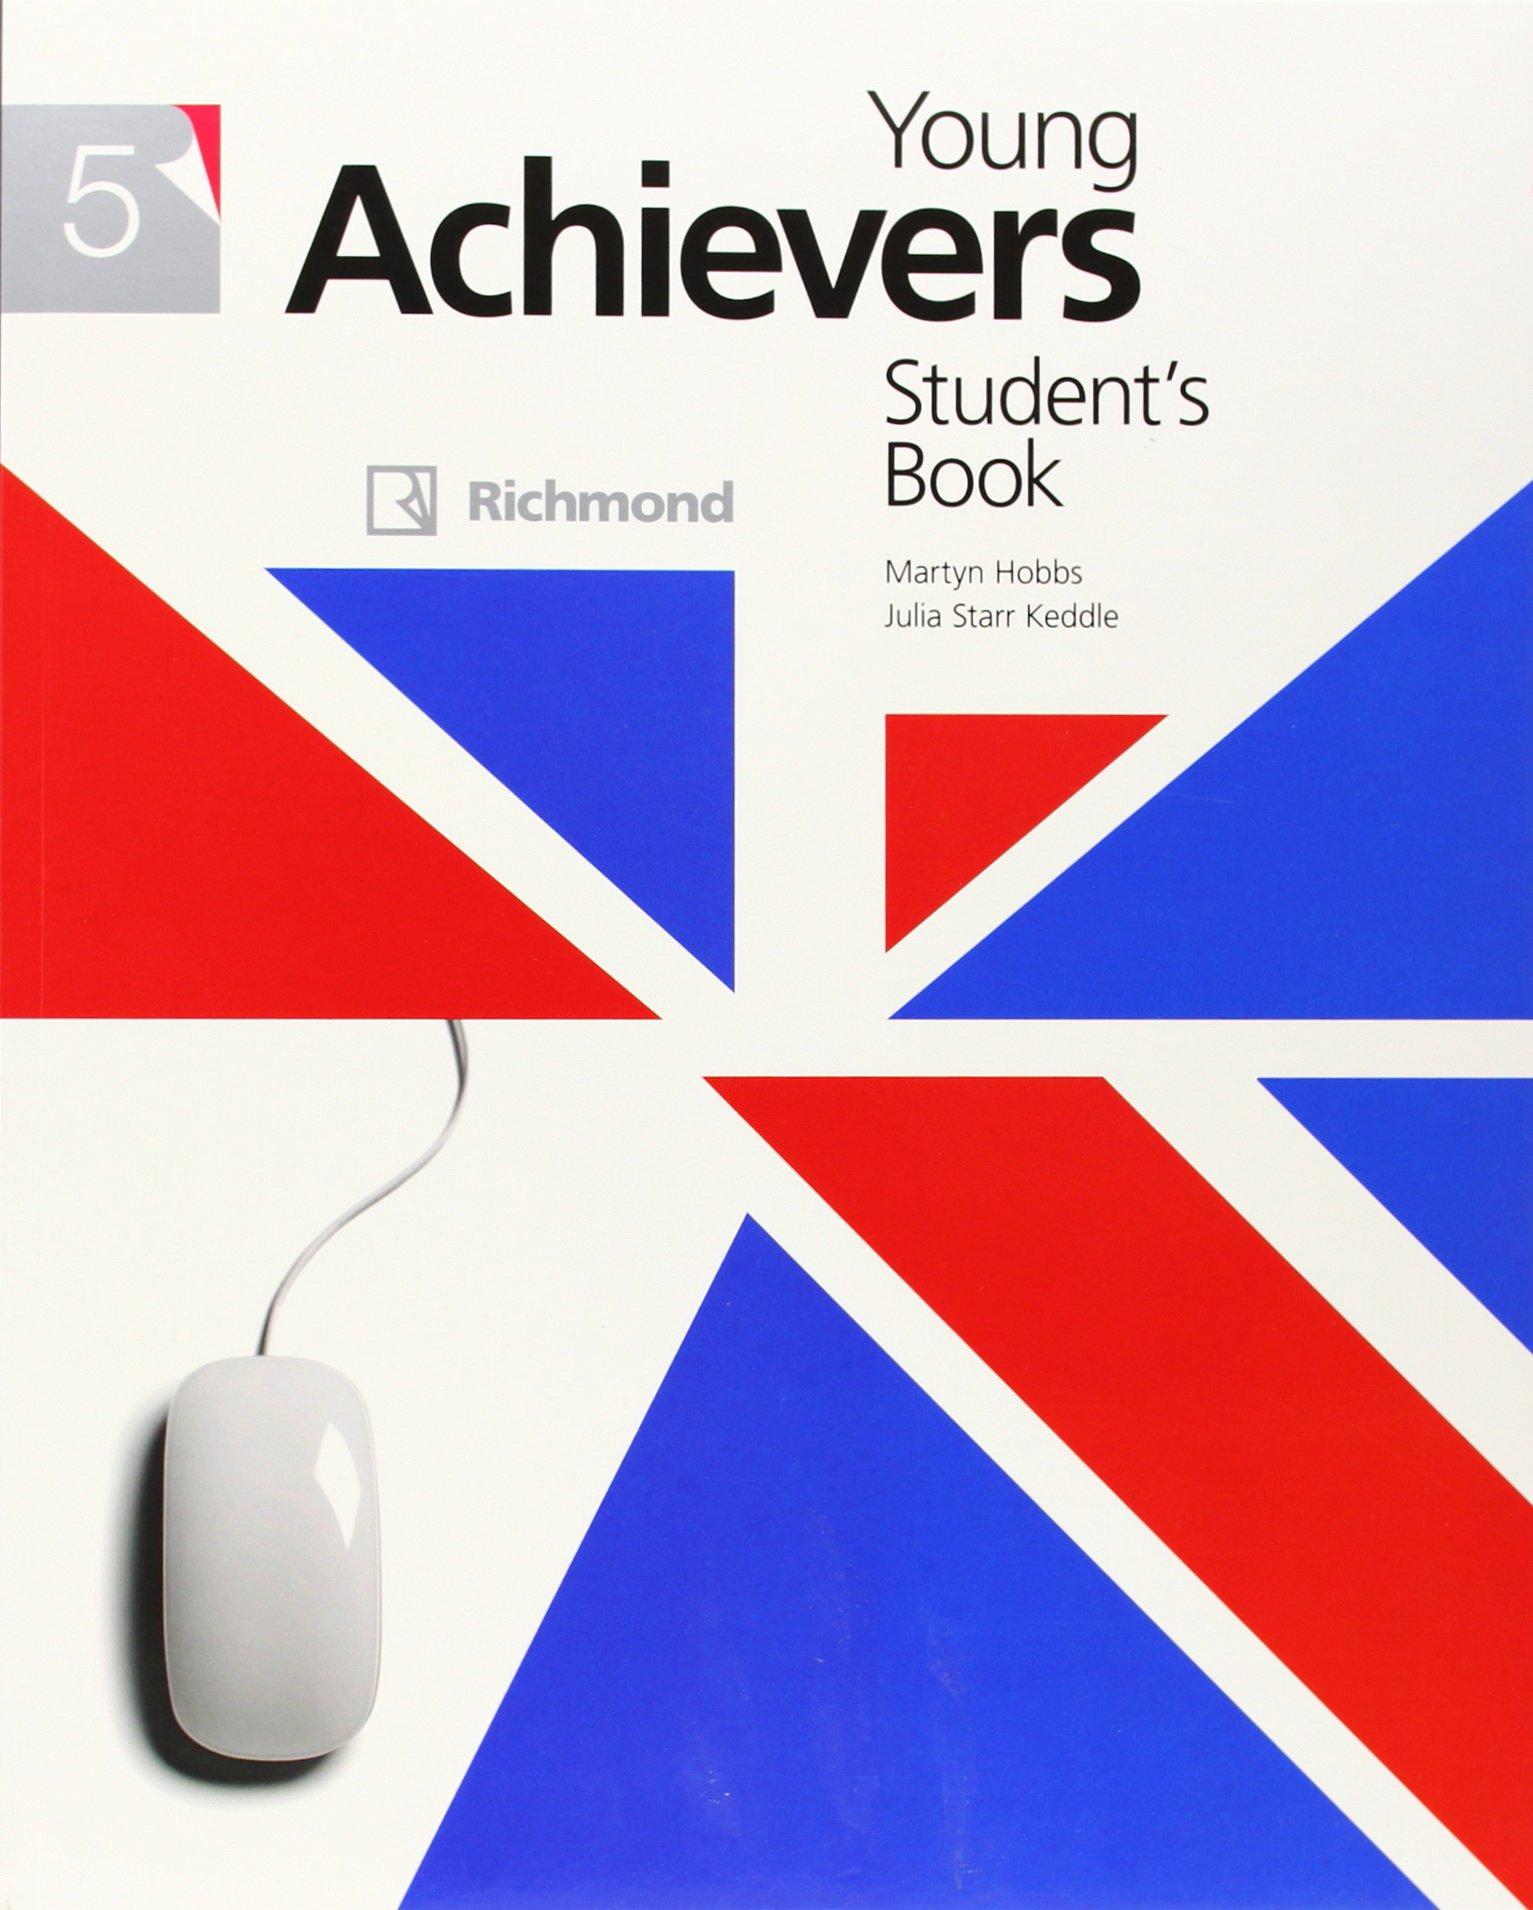 YOUNG ACHIEVERS 5 STUDENTS BOOK - 9788466820226: Amazon.es: Aa.Vv.: Libros en idiomas extranjeros